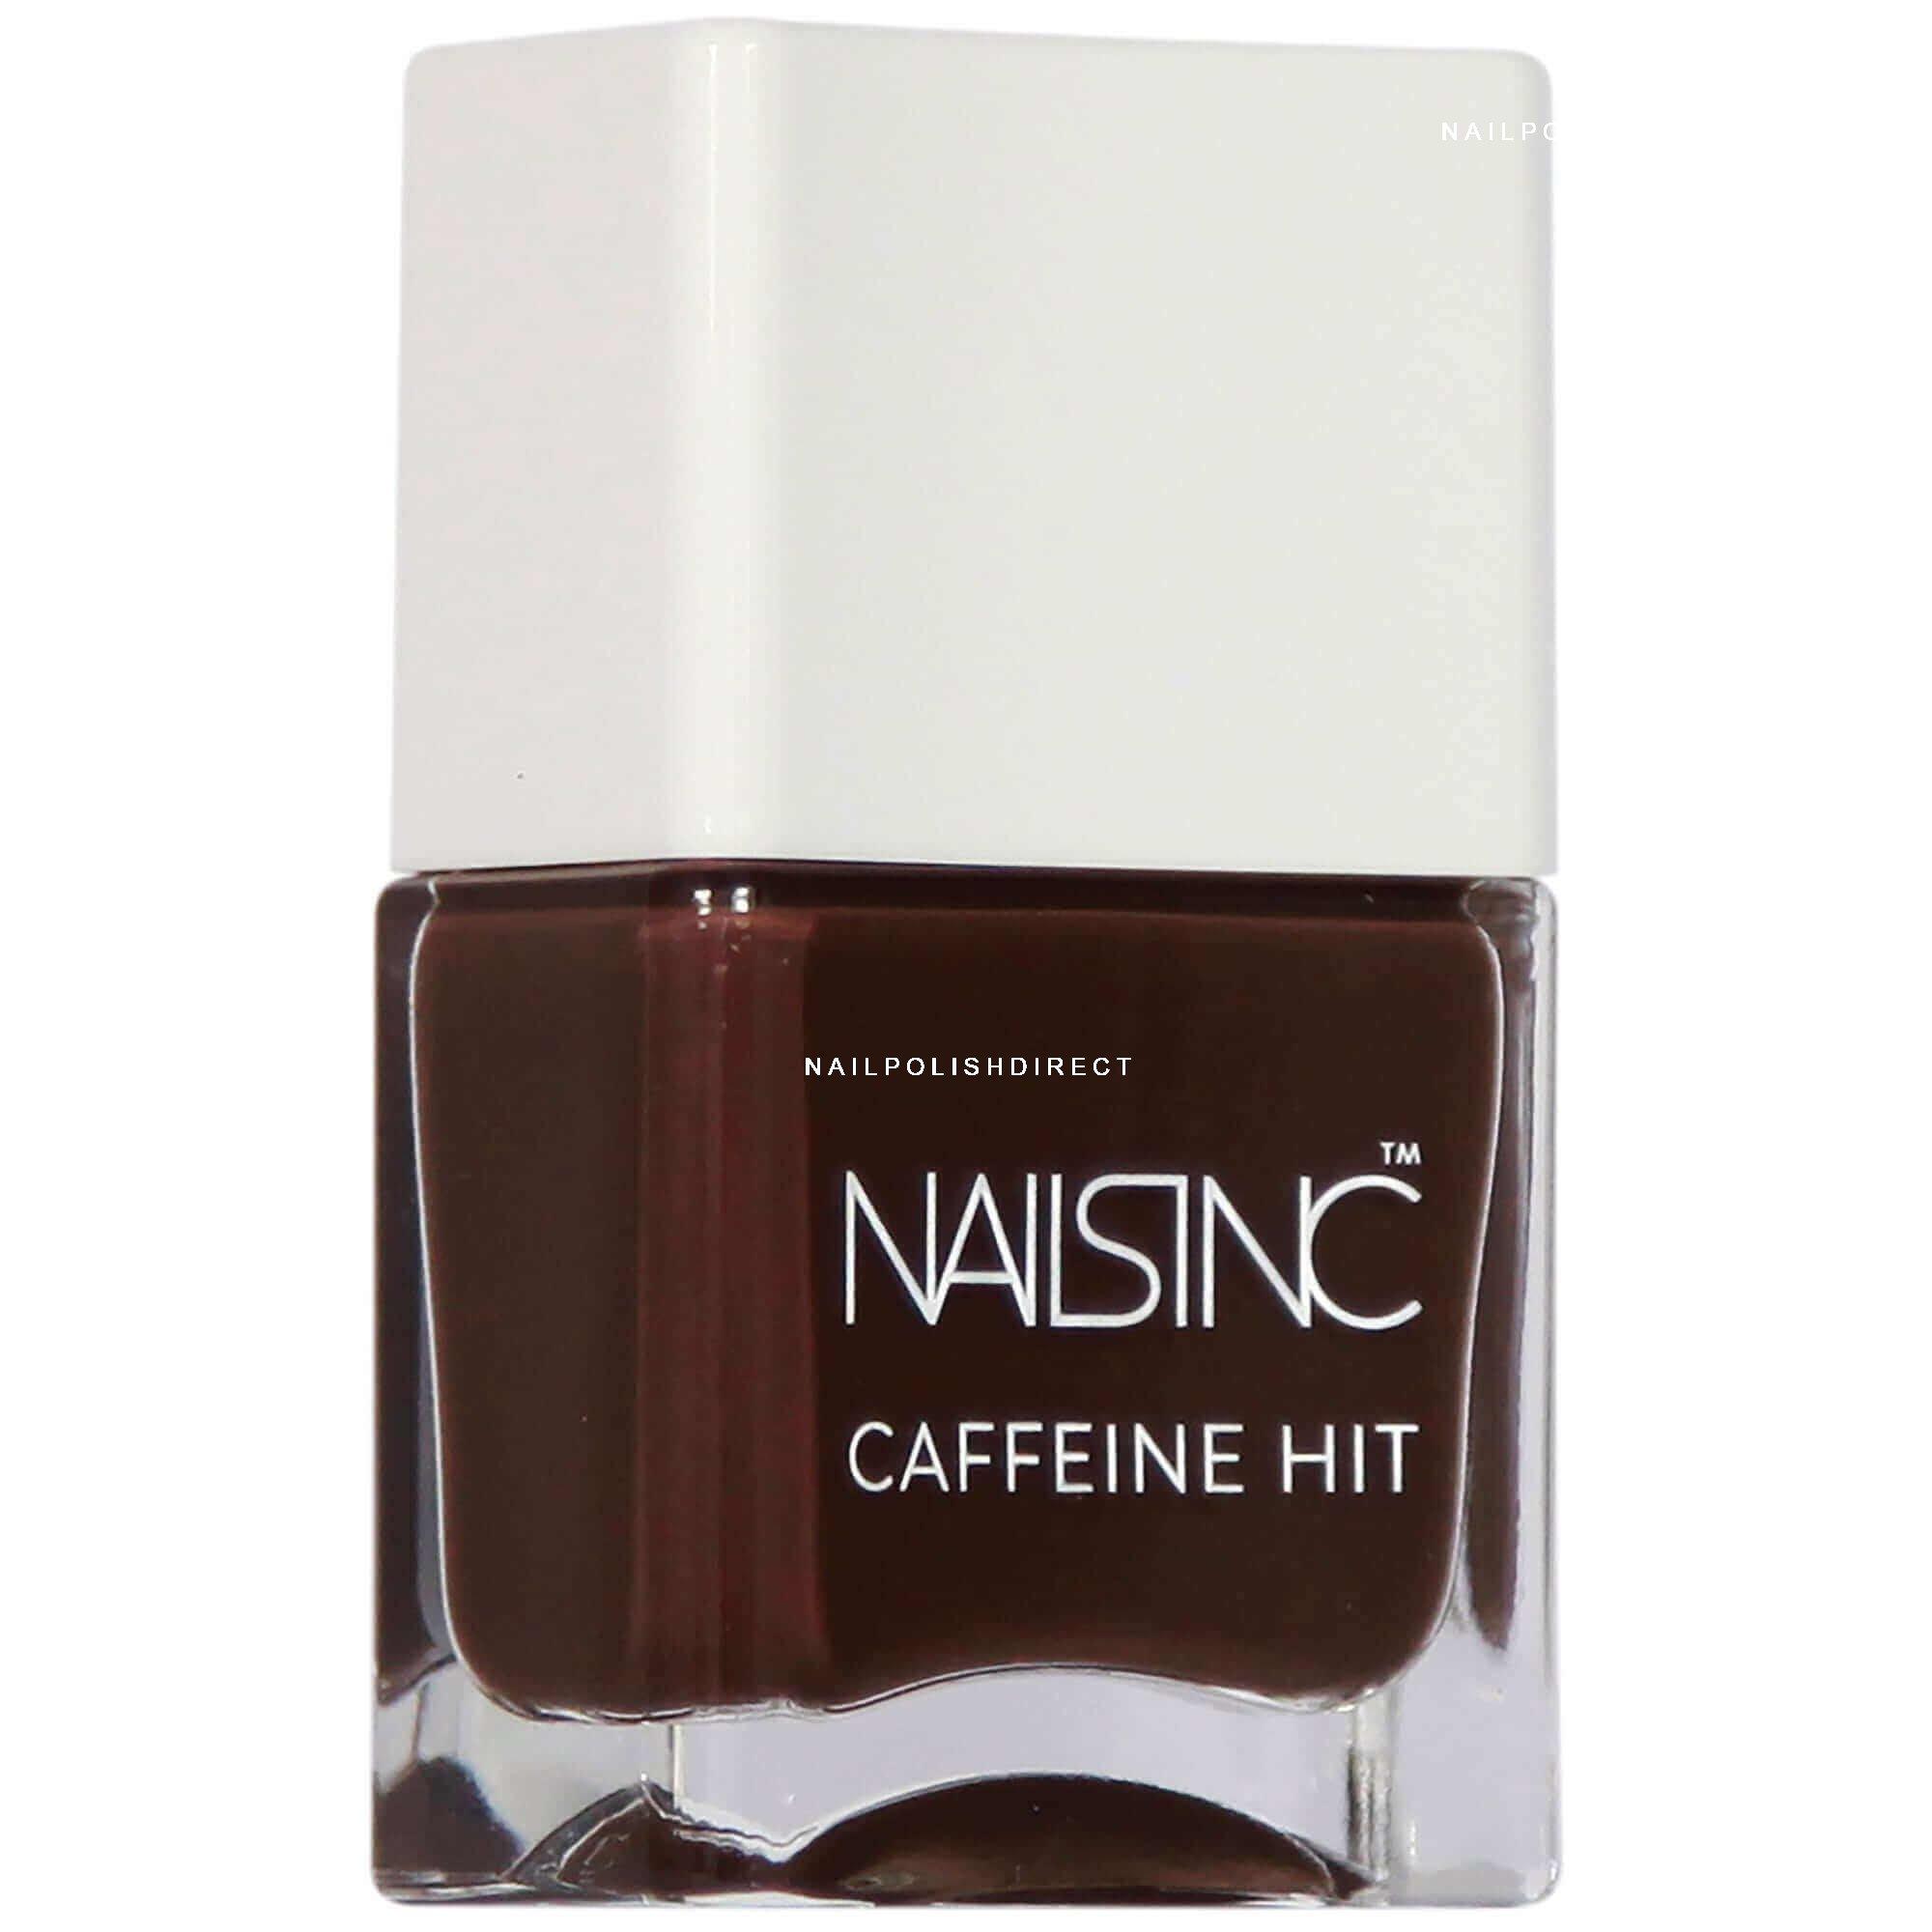 Nails inc Caffeine Hit Collection - Espresso Martini Nail Polish 14ml